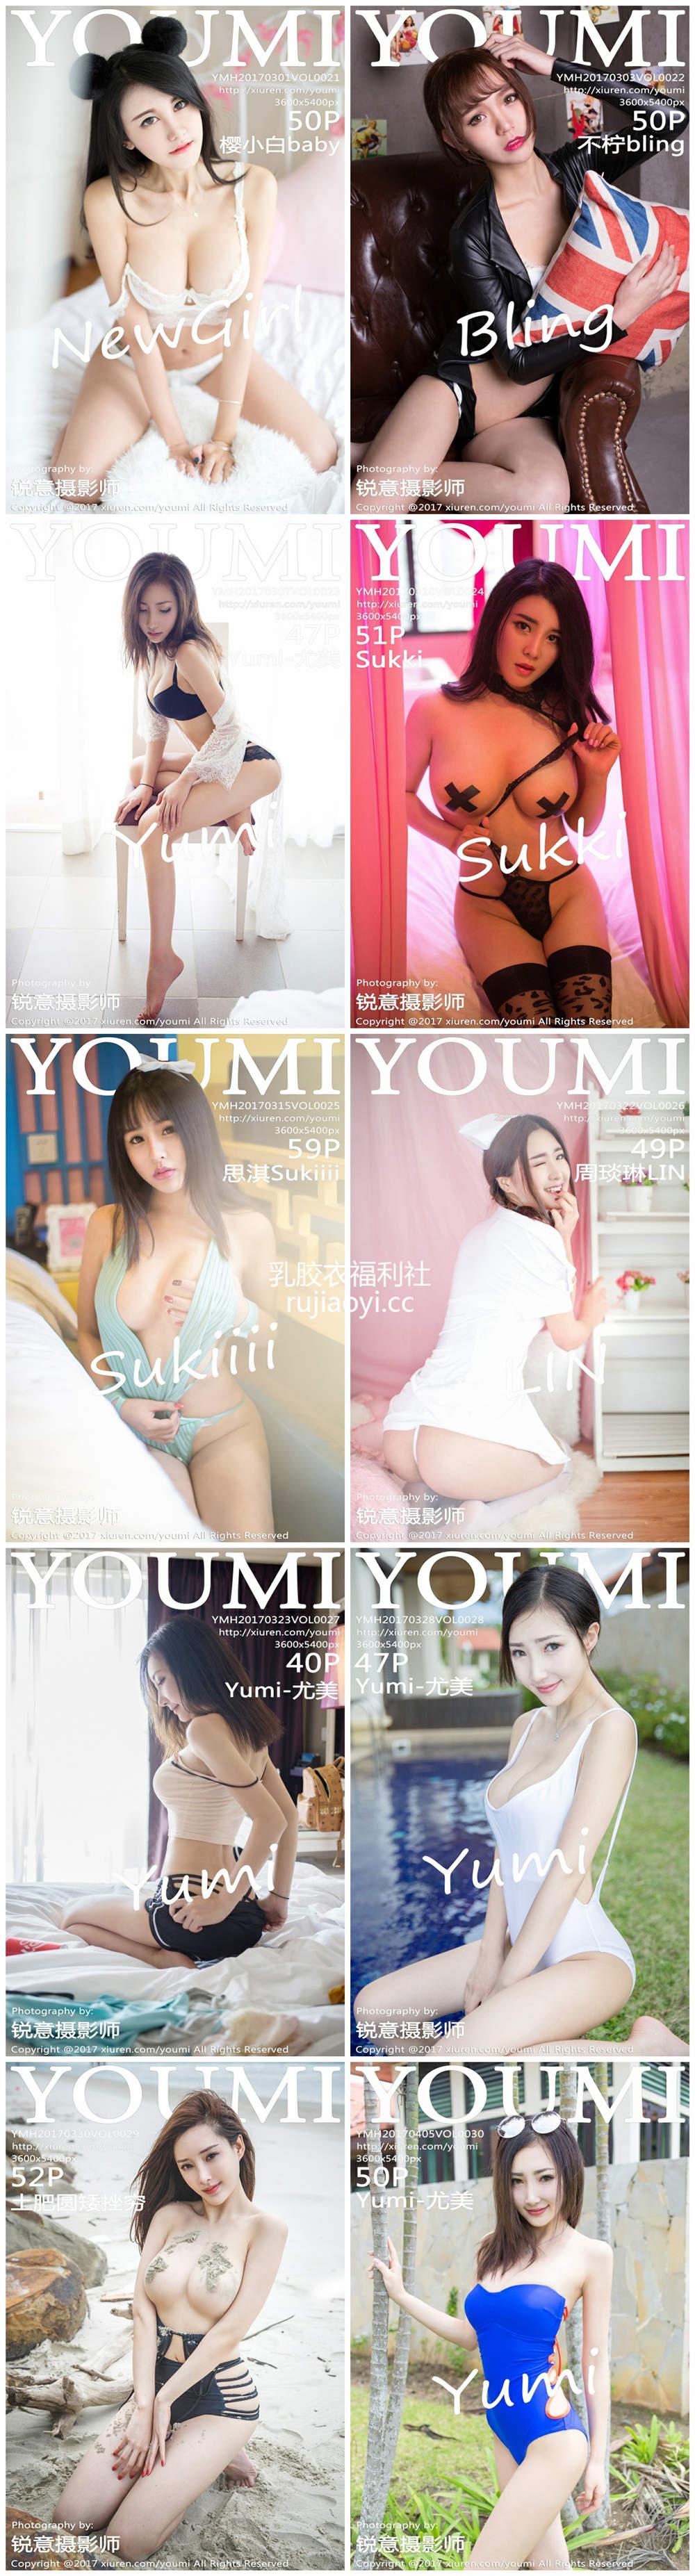 [YOUMI尤蜜荟] Vol.021-030 秀人旗下系列 10期性感美女写真百度云合集下载